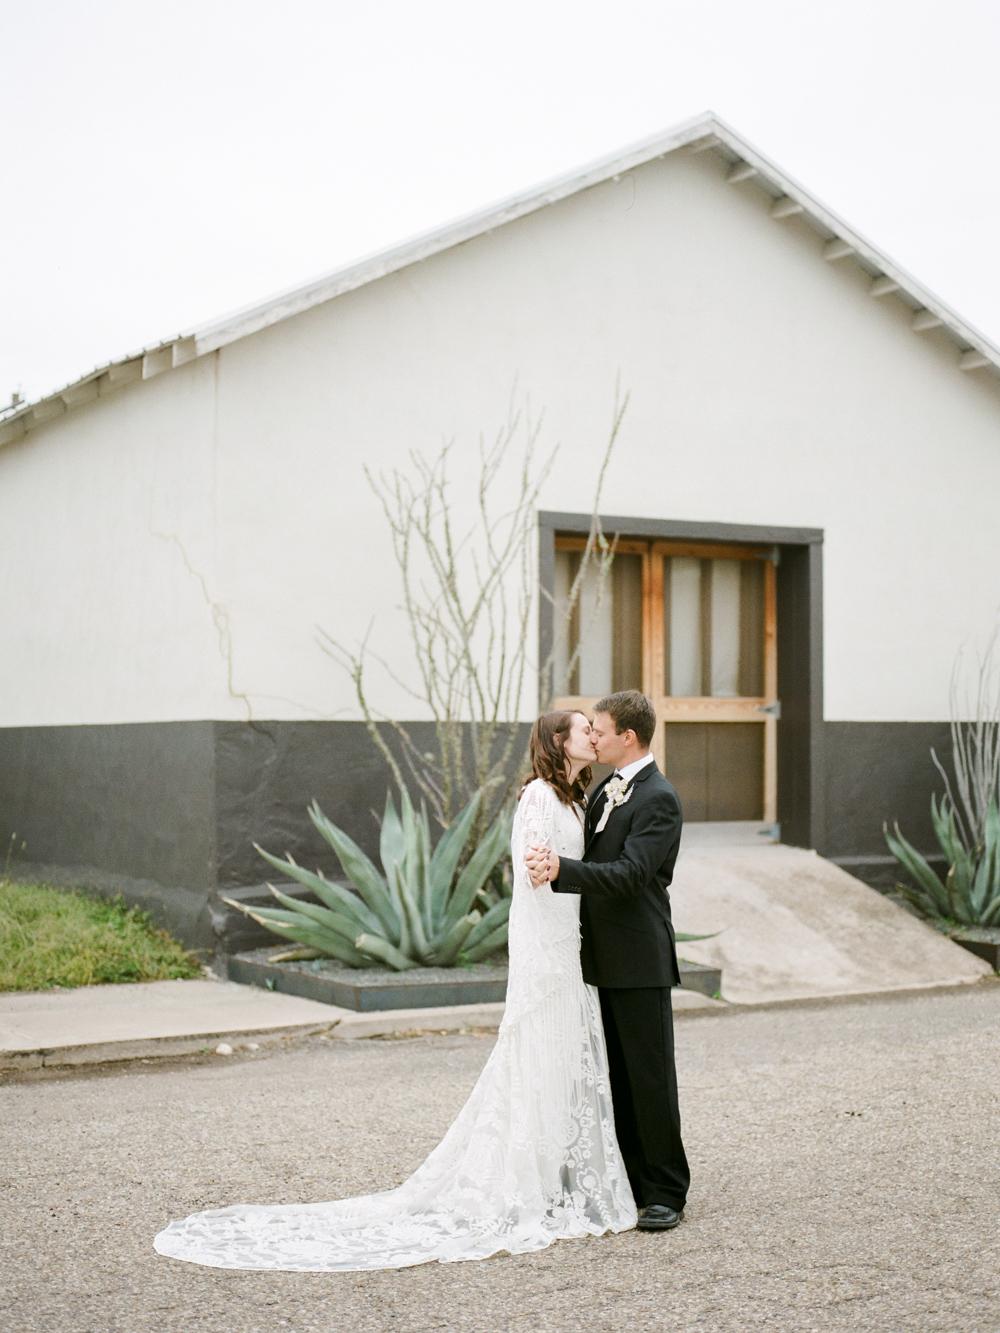 Marfa wedding photographer- destination wedding photographer-christine gosch - film photographer - elopement photographer-14.jpg